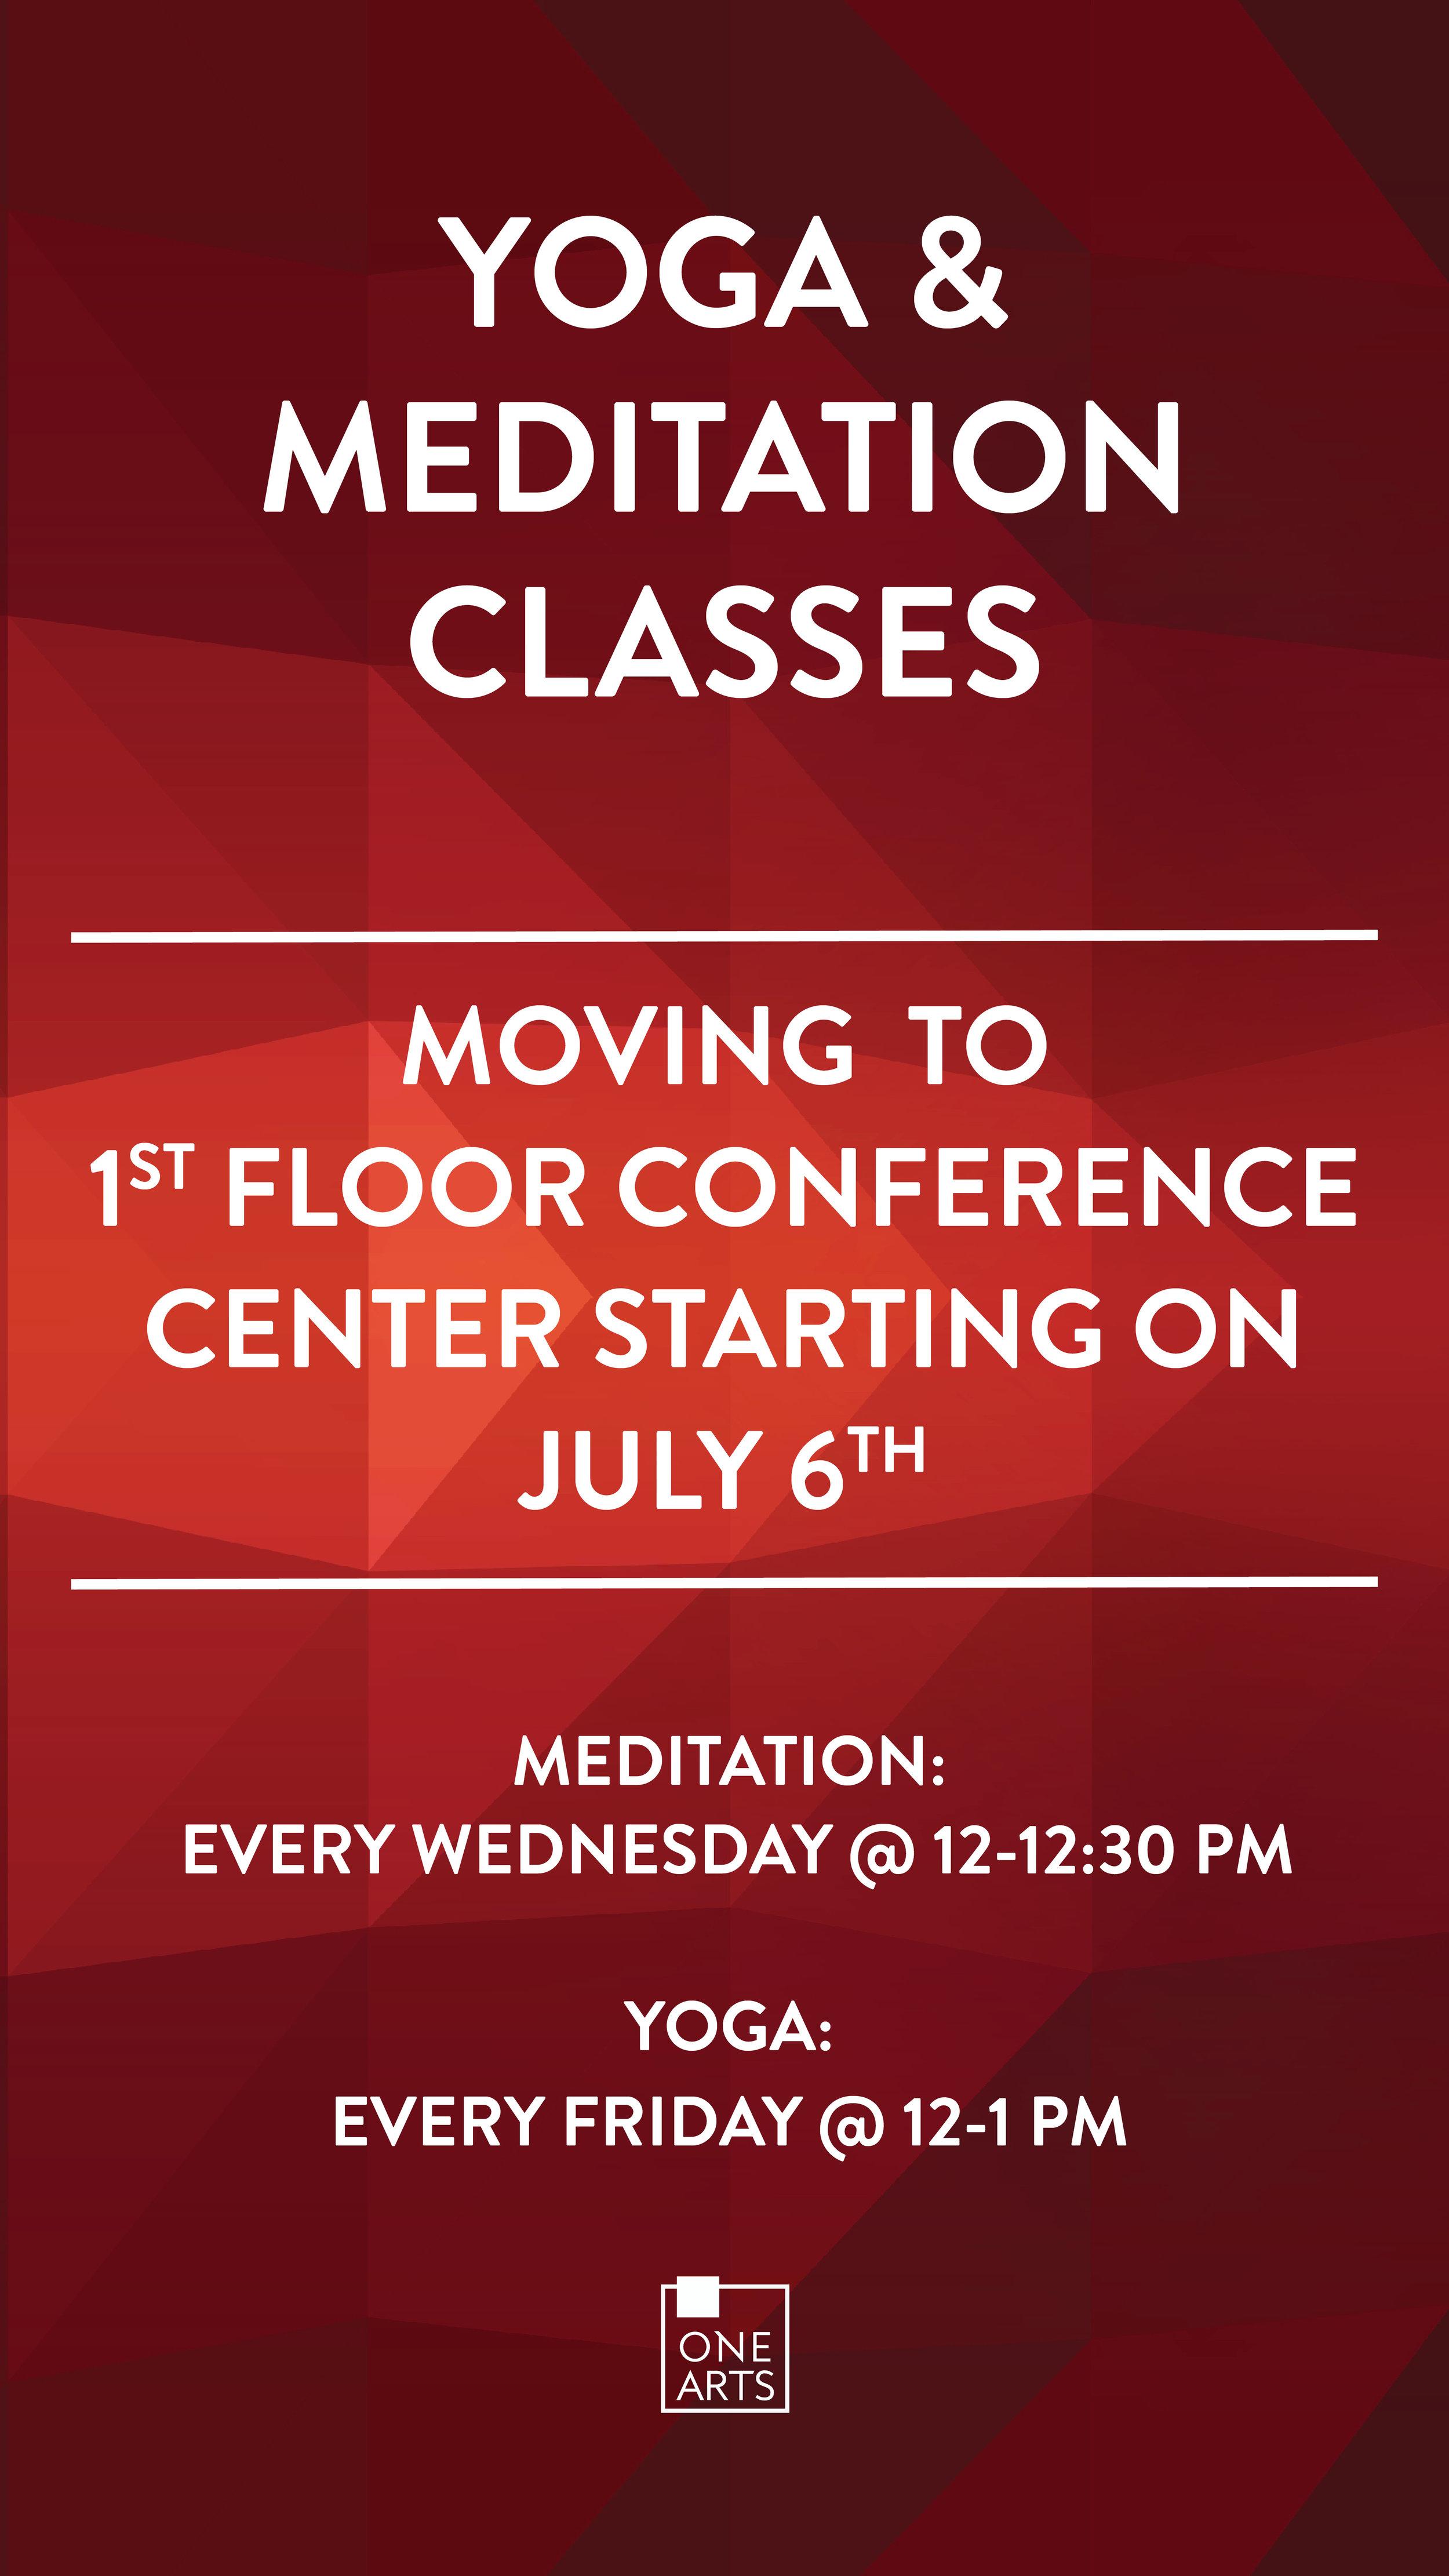 MeditationYogaClassesMoved_ConferenceCenter.jpg